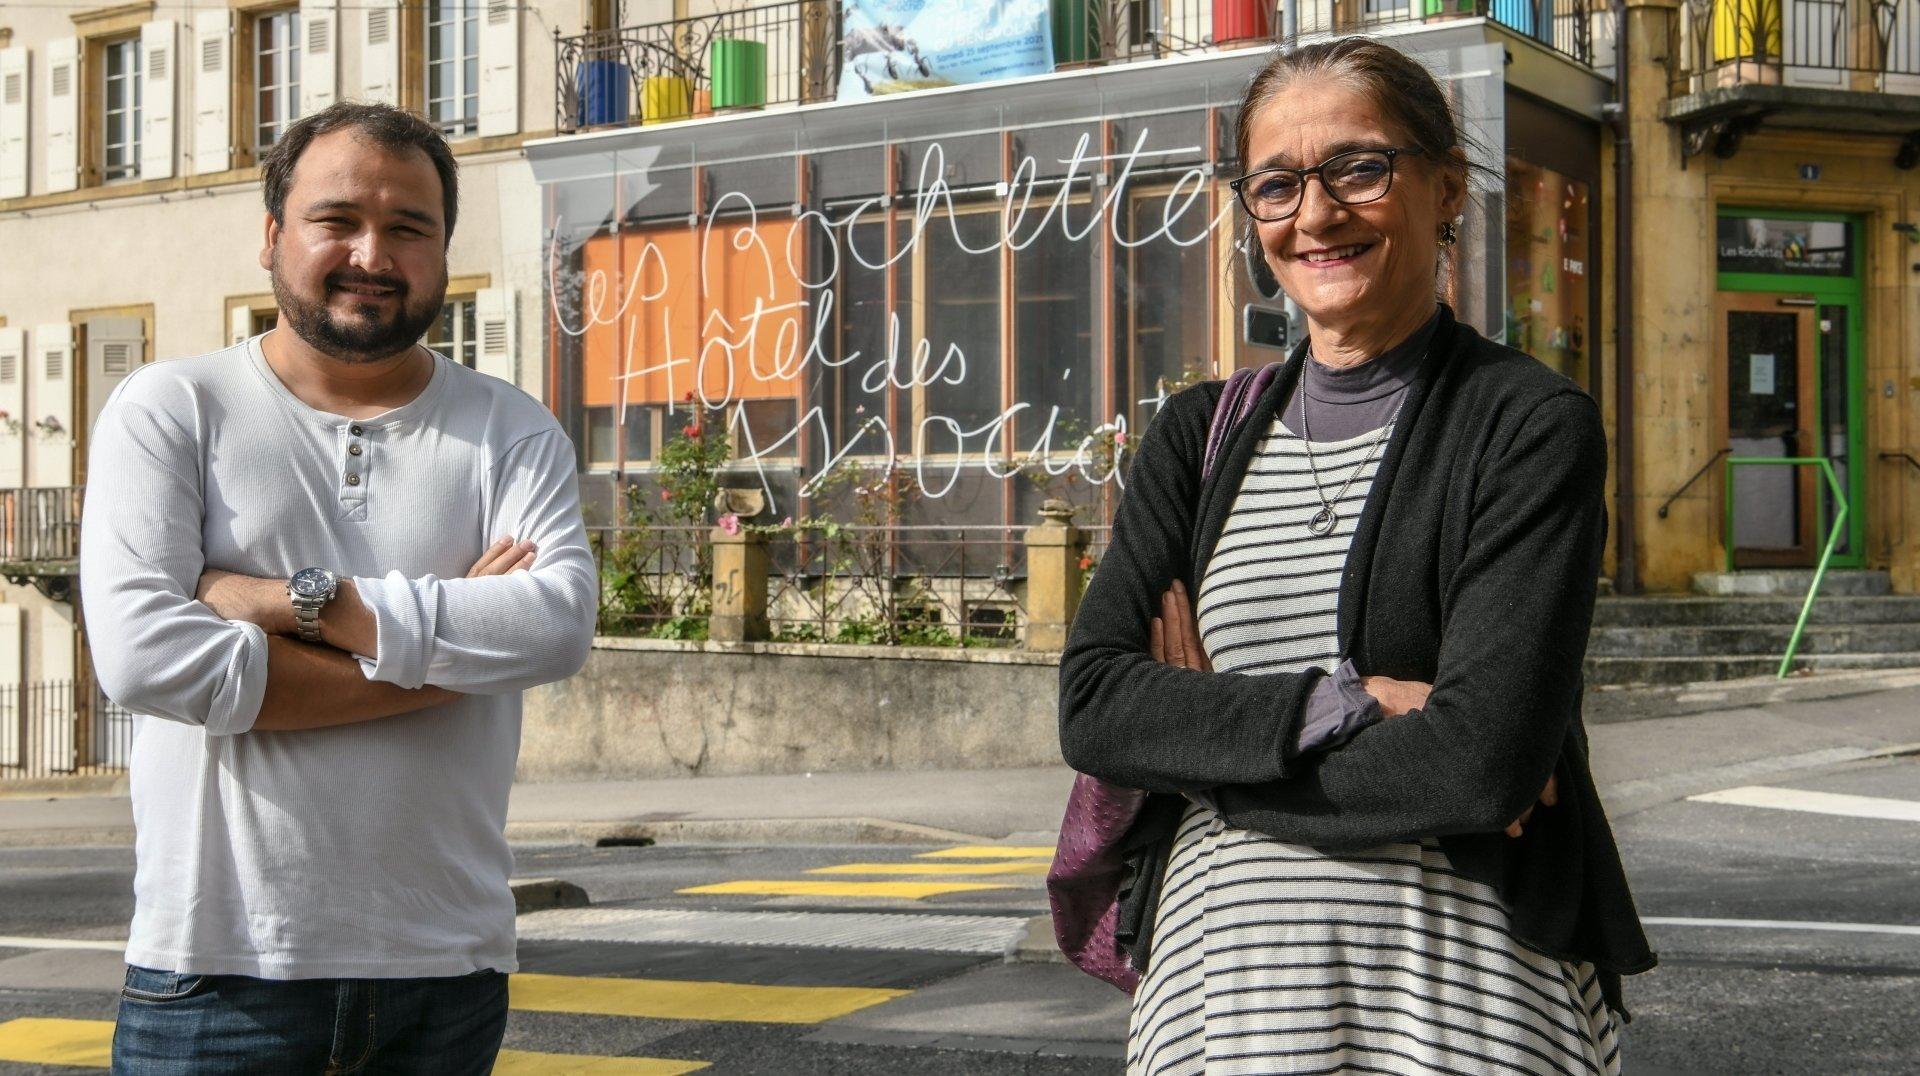 Neuchâtel: ils ont reconstruit leur vie grâce au bénévolat